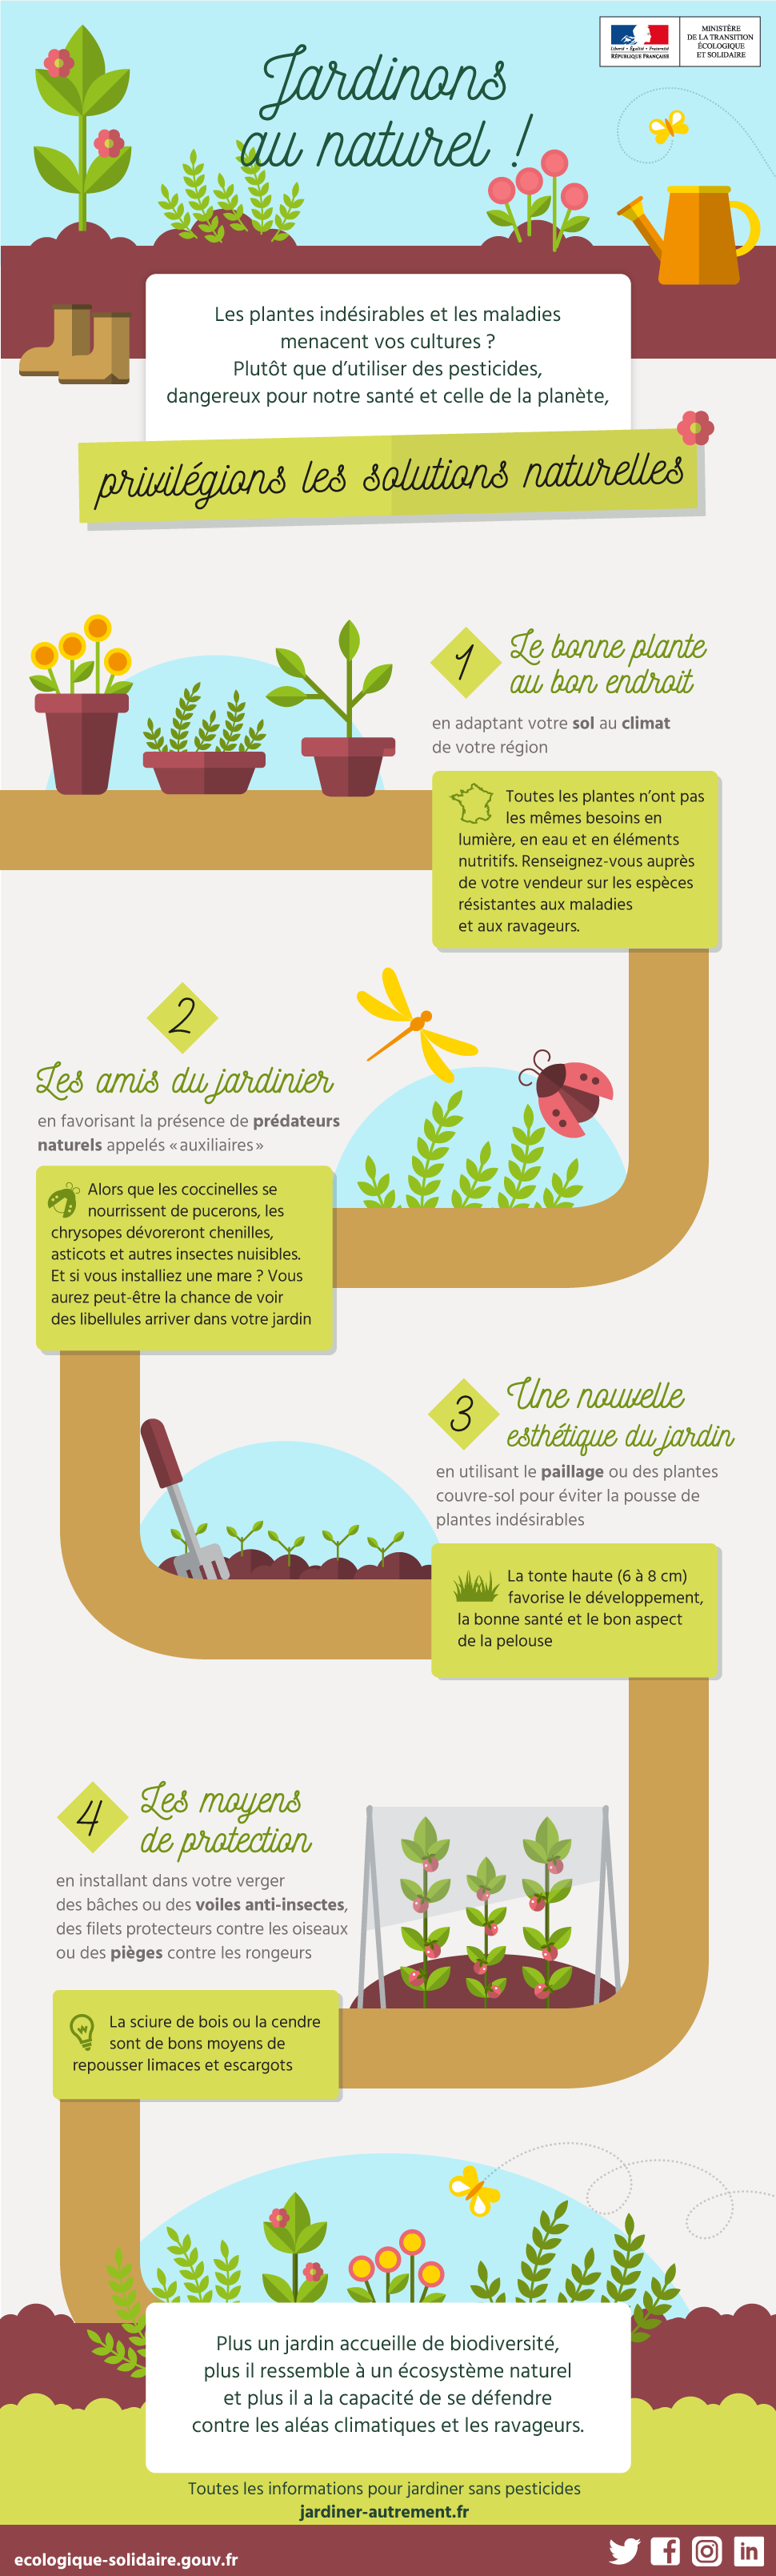 [Infographie] Jardinons au naturel